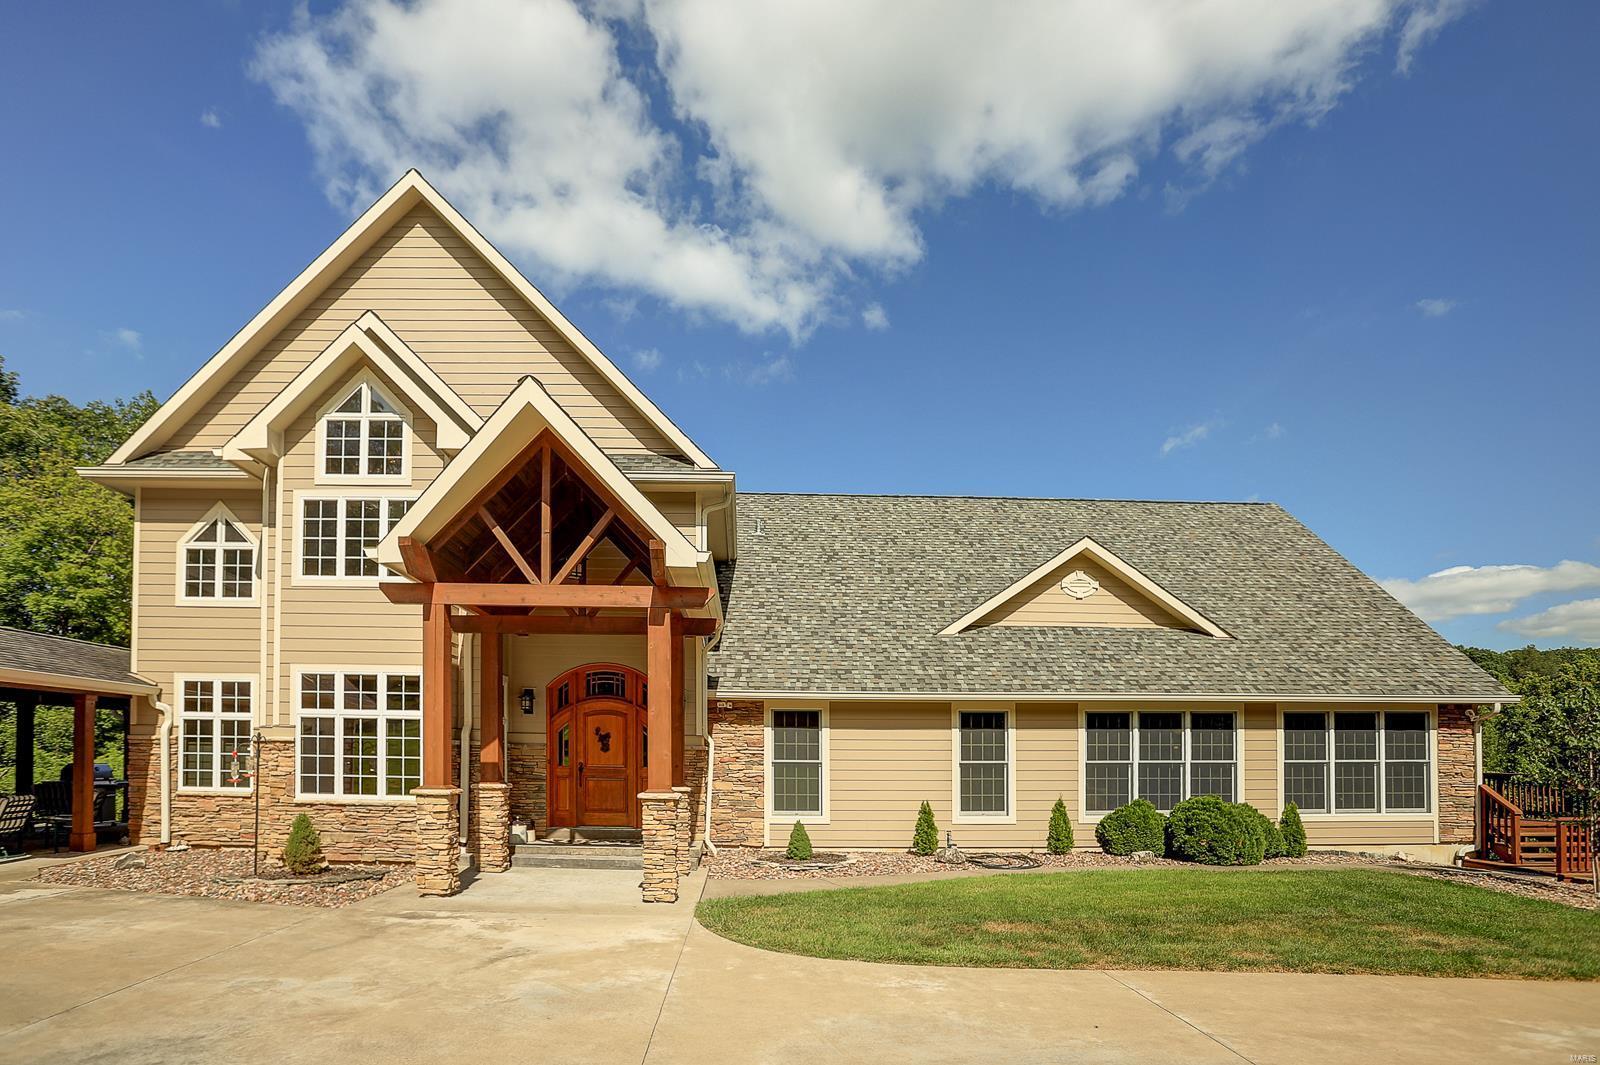 4016 Stanka Lane Property Photo - Godfrey, IL real estate listing